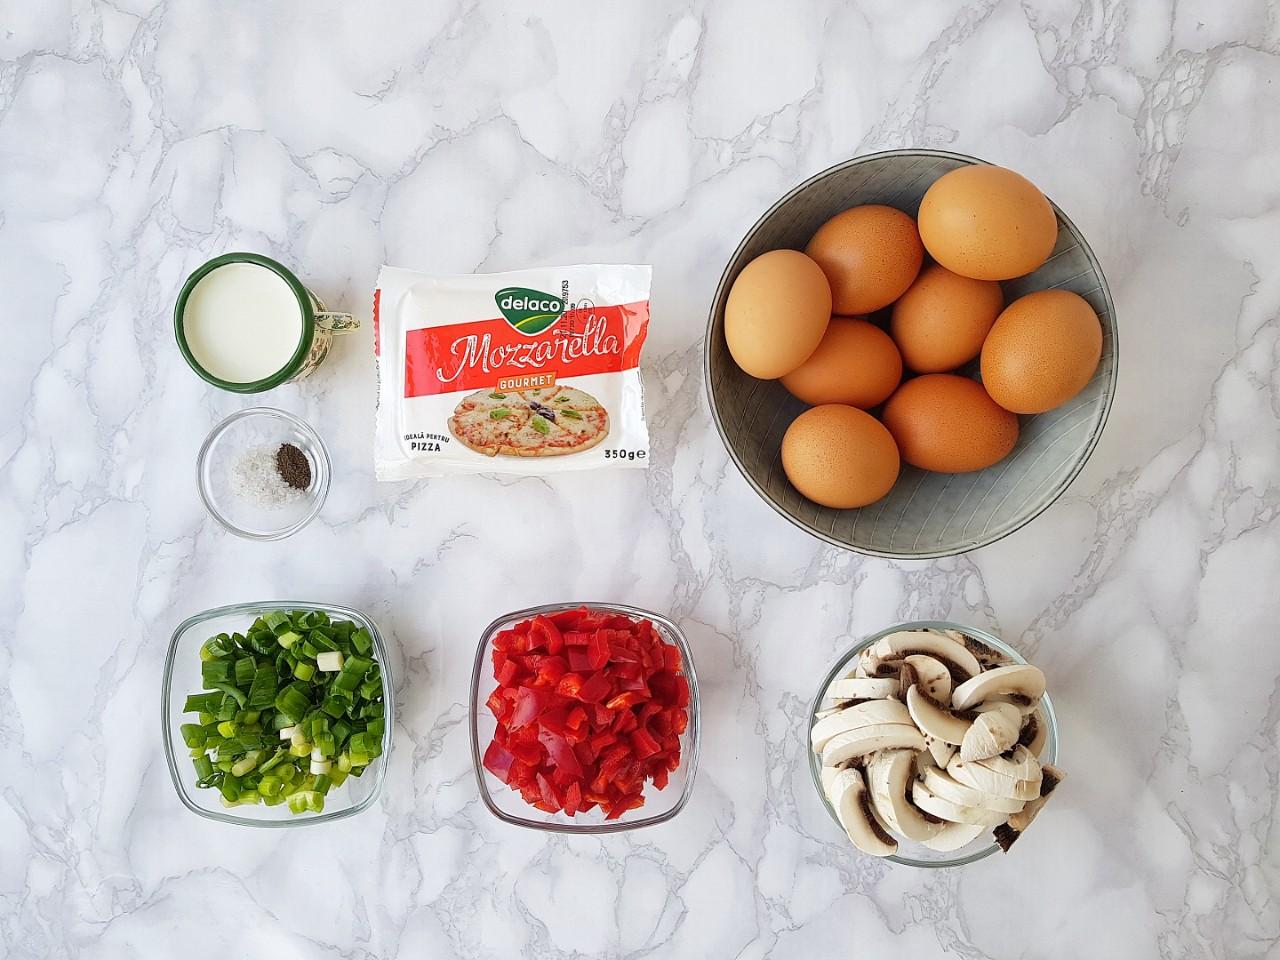 Frittata cu mozzarella si legume - foodieopedia